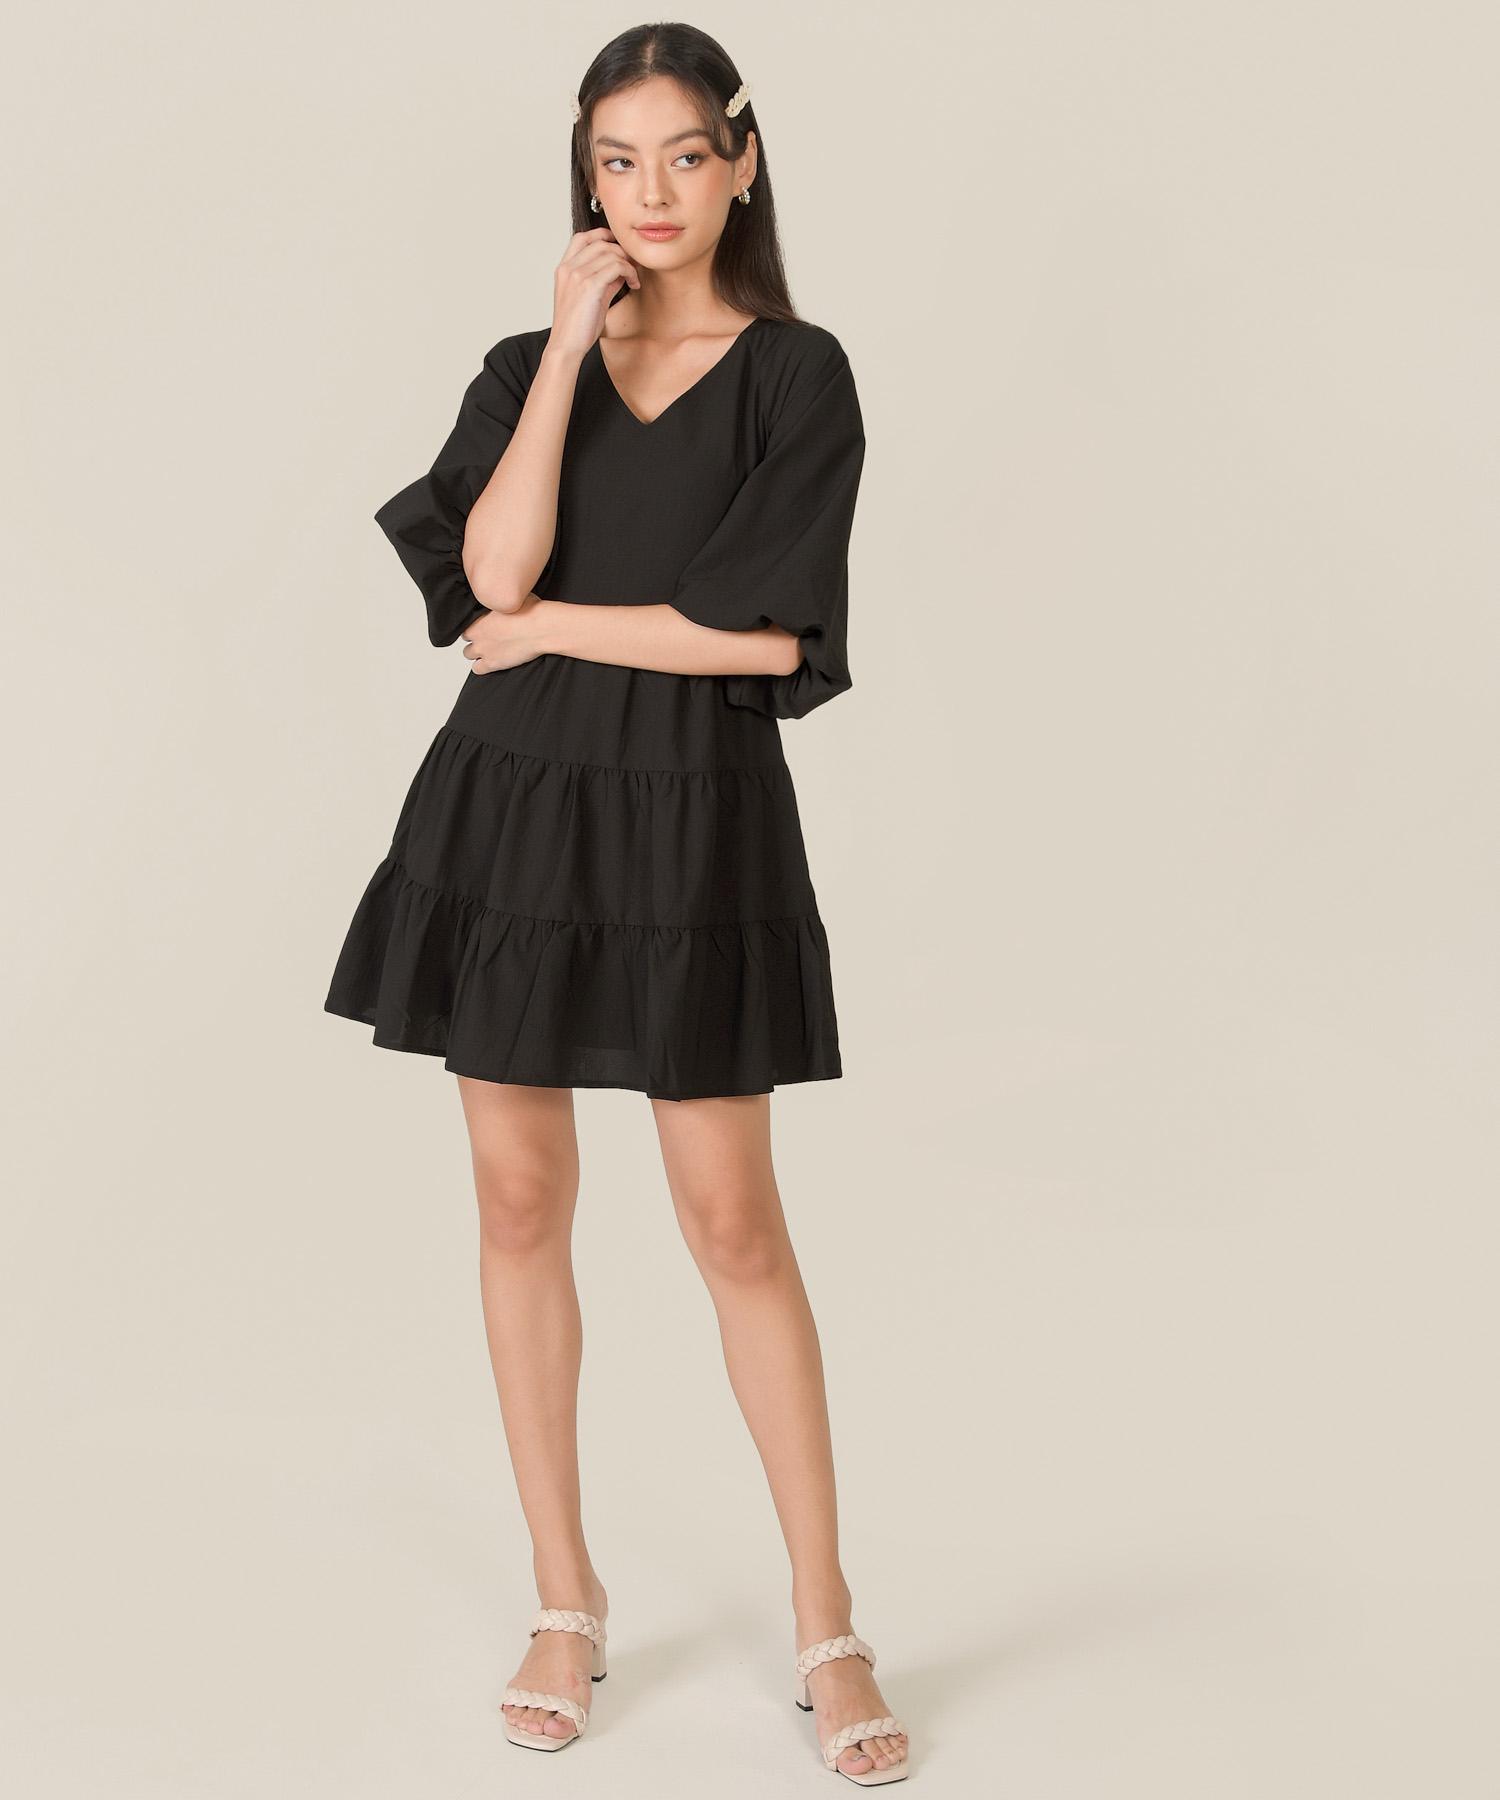 bellina-puff-sleeve-tiered-dress-black-1